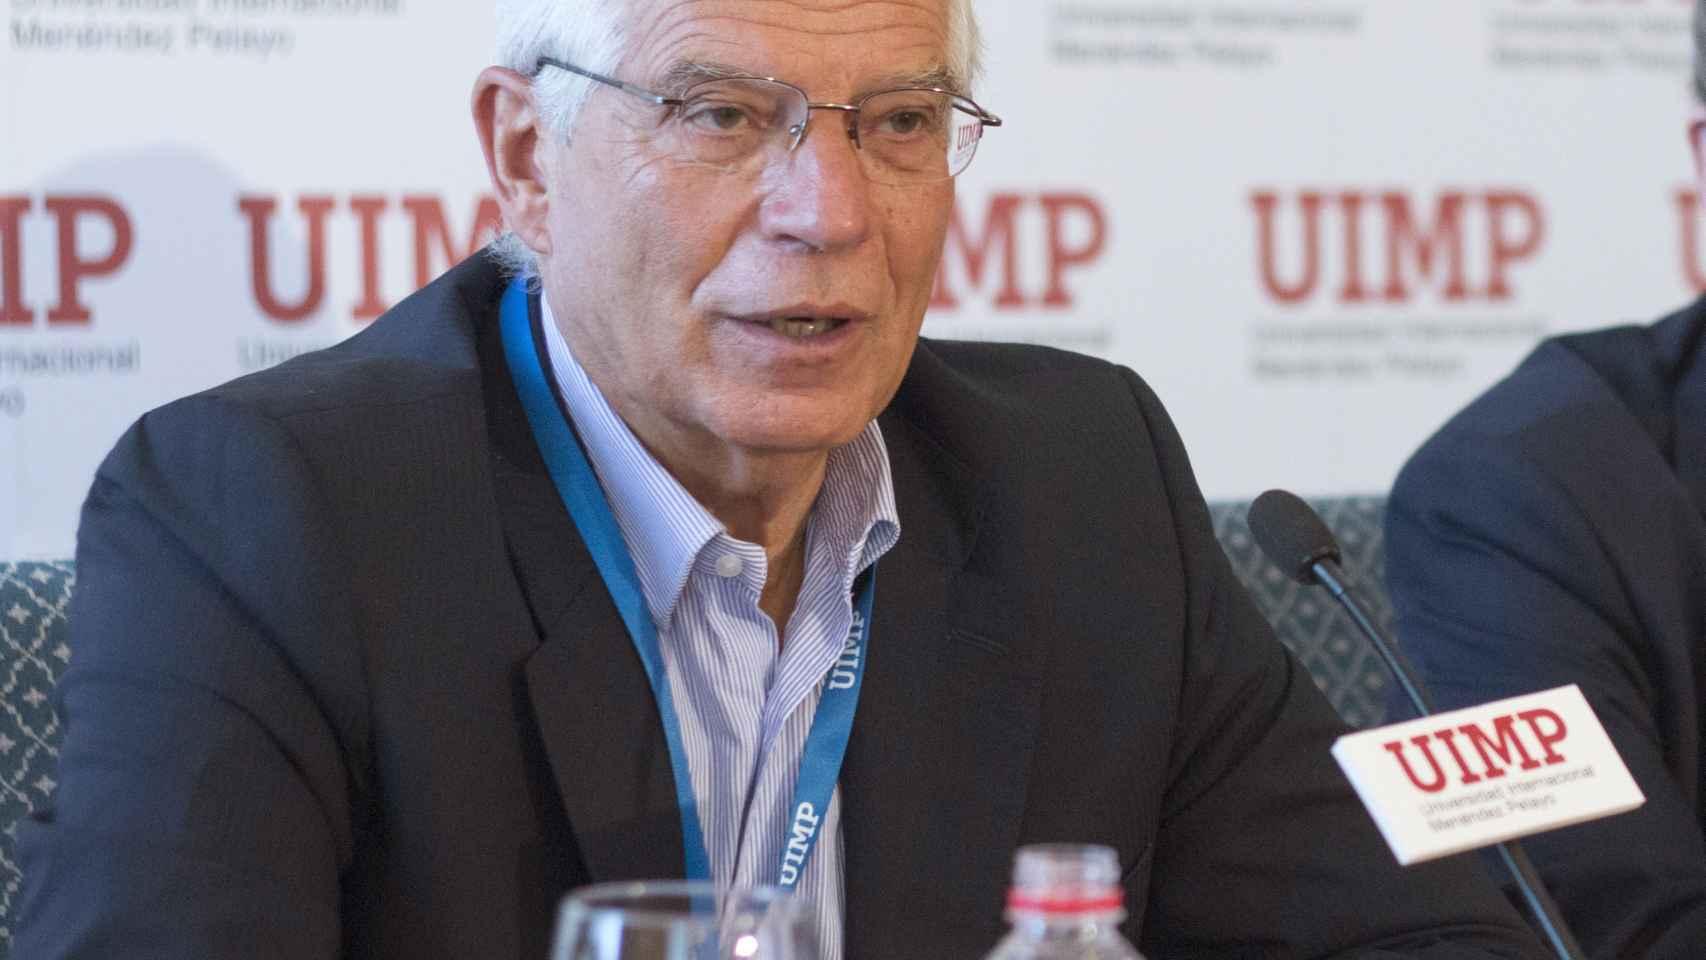 Josep Borrell en la Universidad Internacional Menéndez Pelayo.